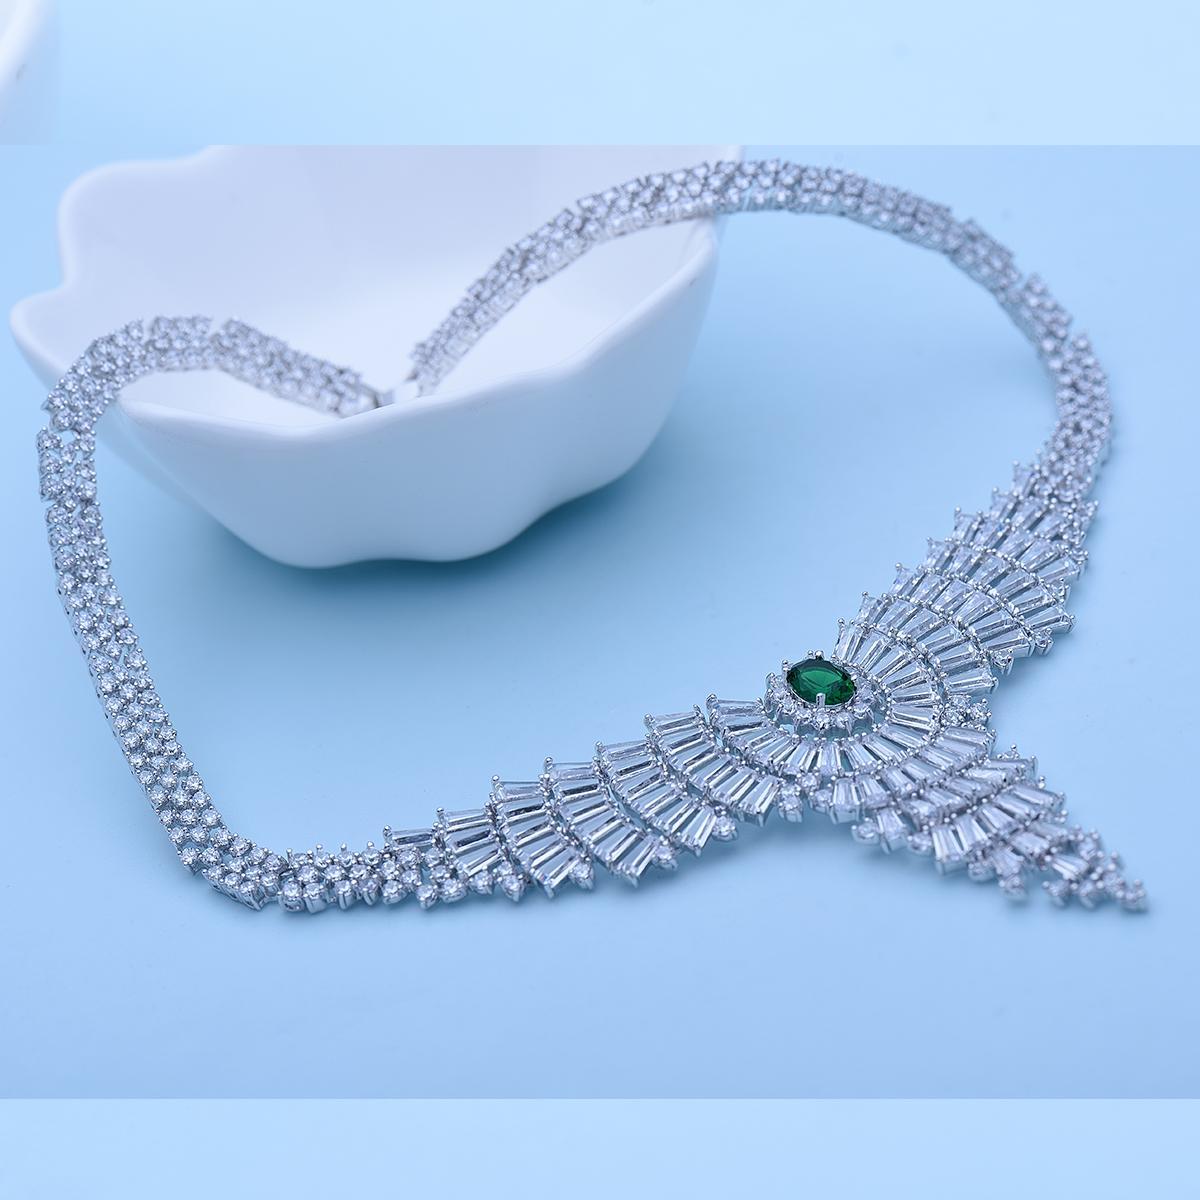 Fashion-I New Luxurious Staterment Choke for Women Shining Zircon Big Pendant White Gold-Color Bridal Wedding Jewelry Jewelry Set Party Gift